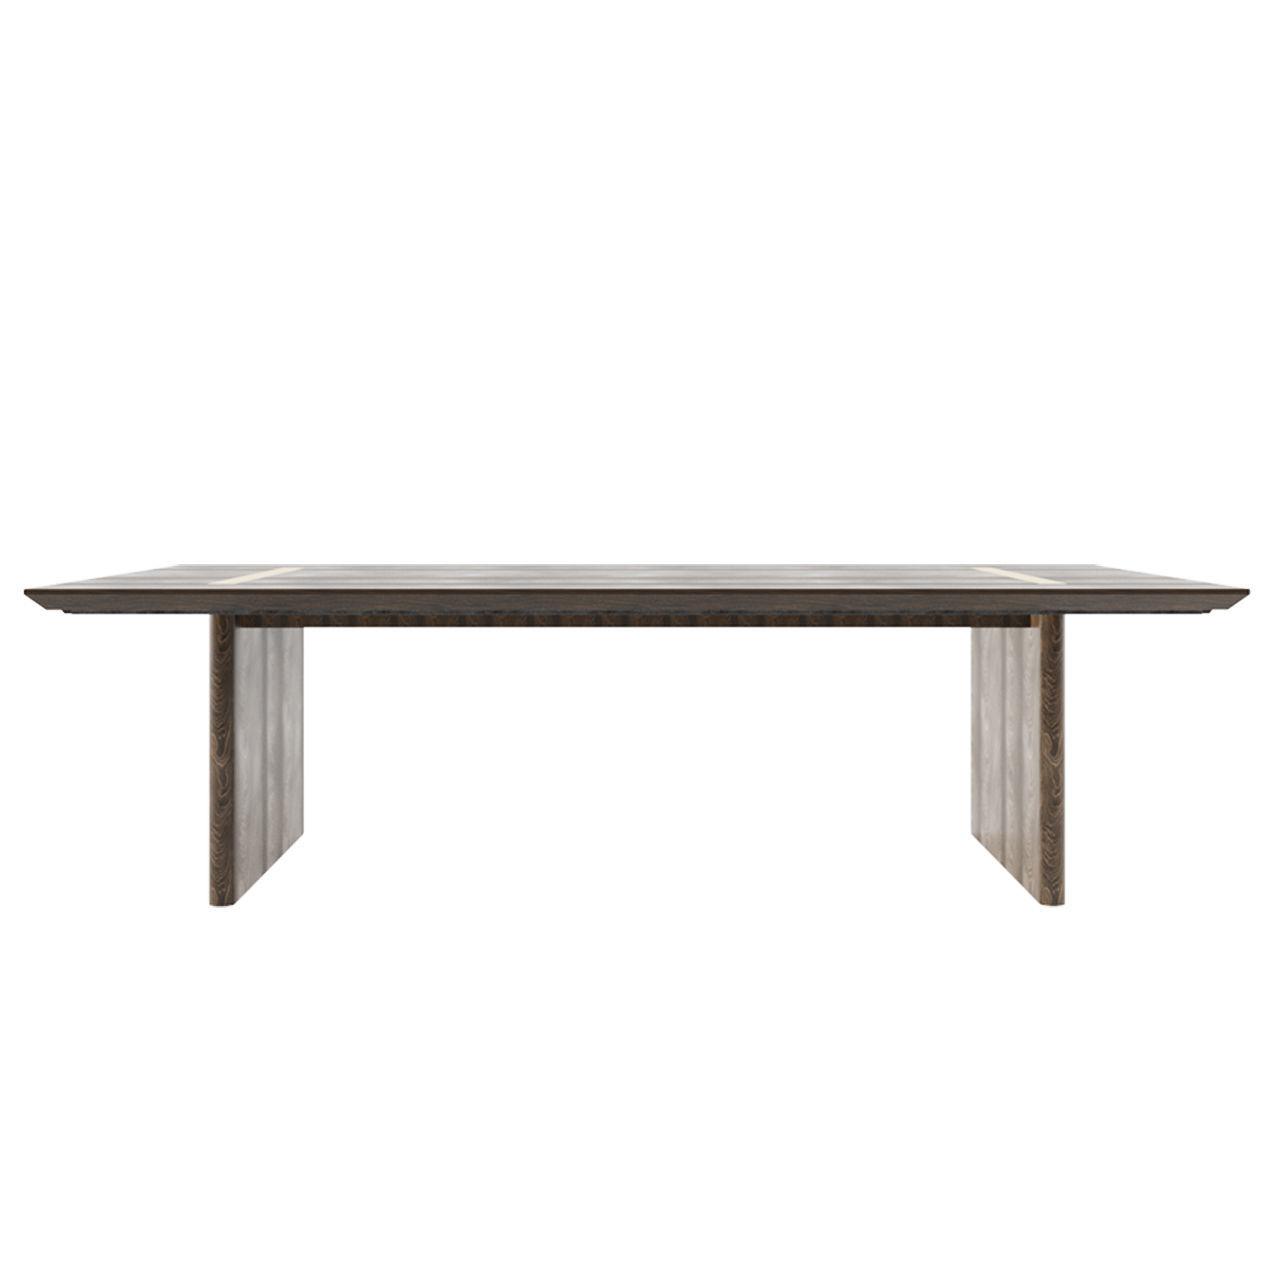 3d Model Rh Balmain Oak Rectangular Extension Dining Table